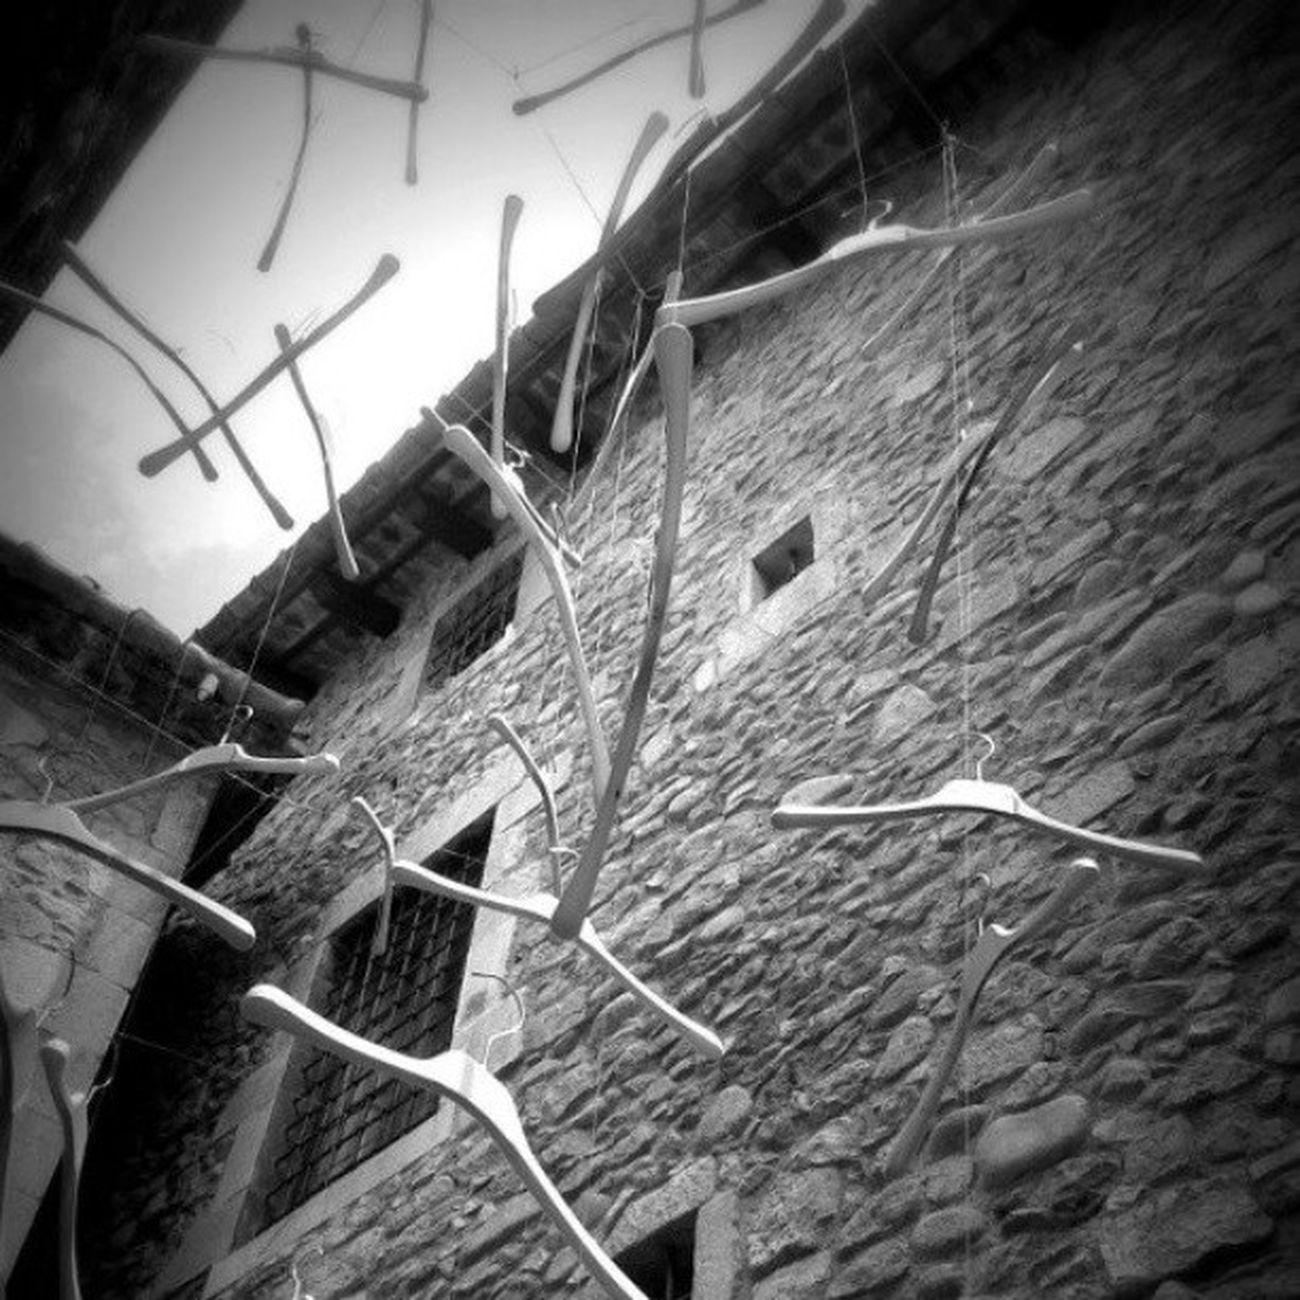 Girona Catalunya Tempsdeflors Igers lescala igersgirona visitlescala gironaemociona flors fotosdesomni descobreixcatalunya catalunyaexperience instagramers instaflors emporda catalunyagrafias igerscatalonia flowers catalonia incostabrava costabrava gironaturisme flores instagirona instagood mar ikg_photos gironatempsdeflors costa gironamenamora